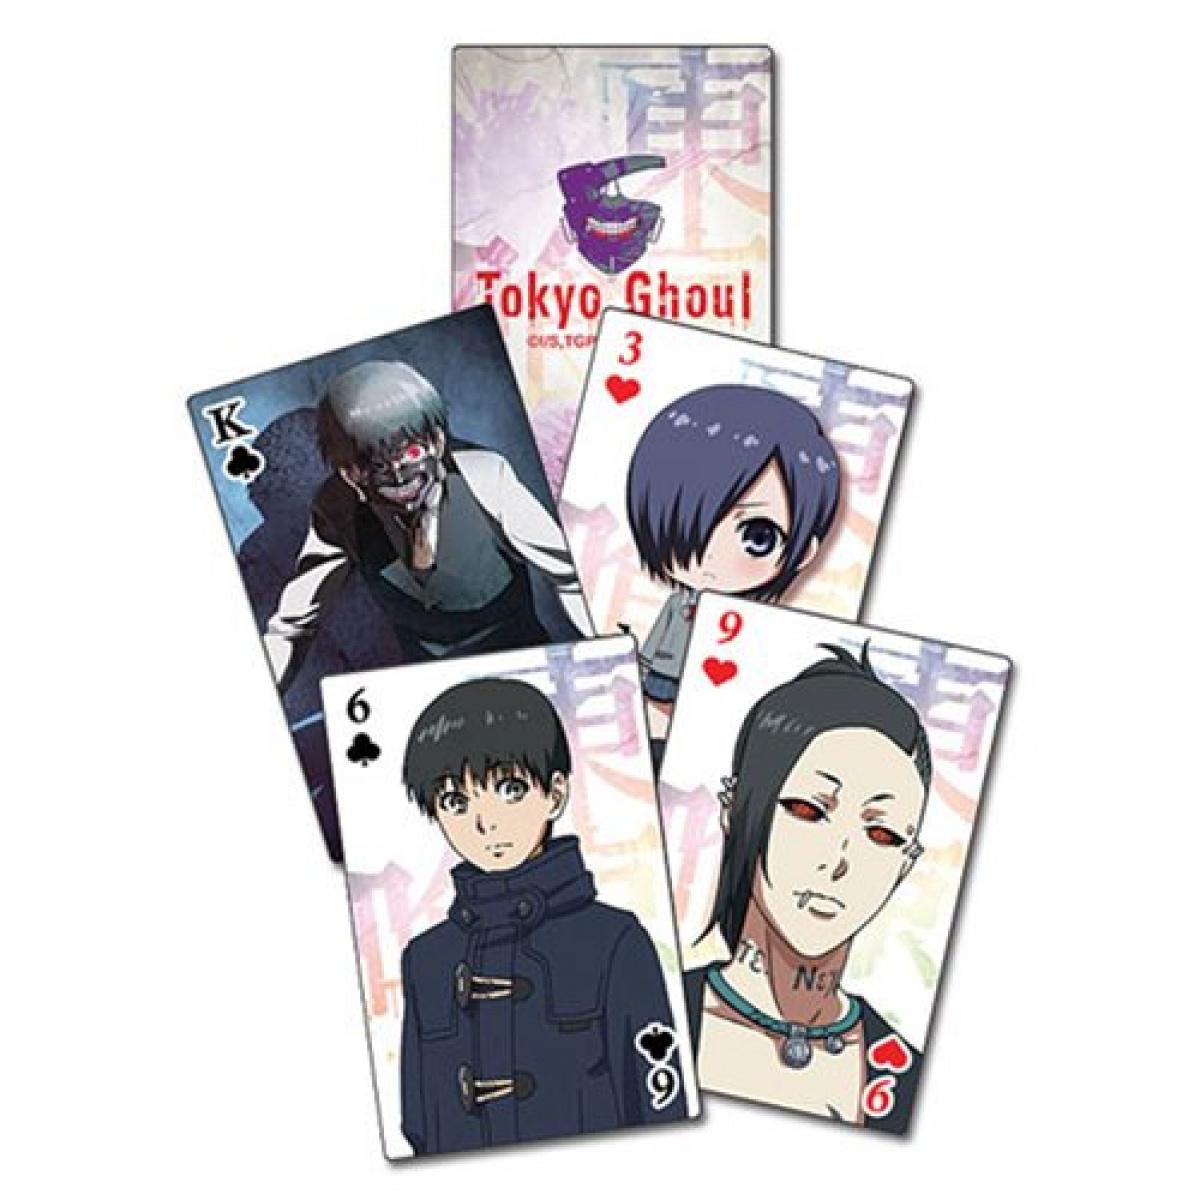 Tokyo Ghoul Chibi Playing Cards Playing Cards 4